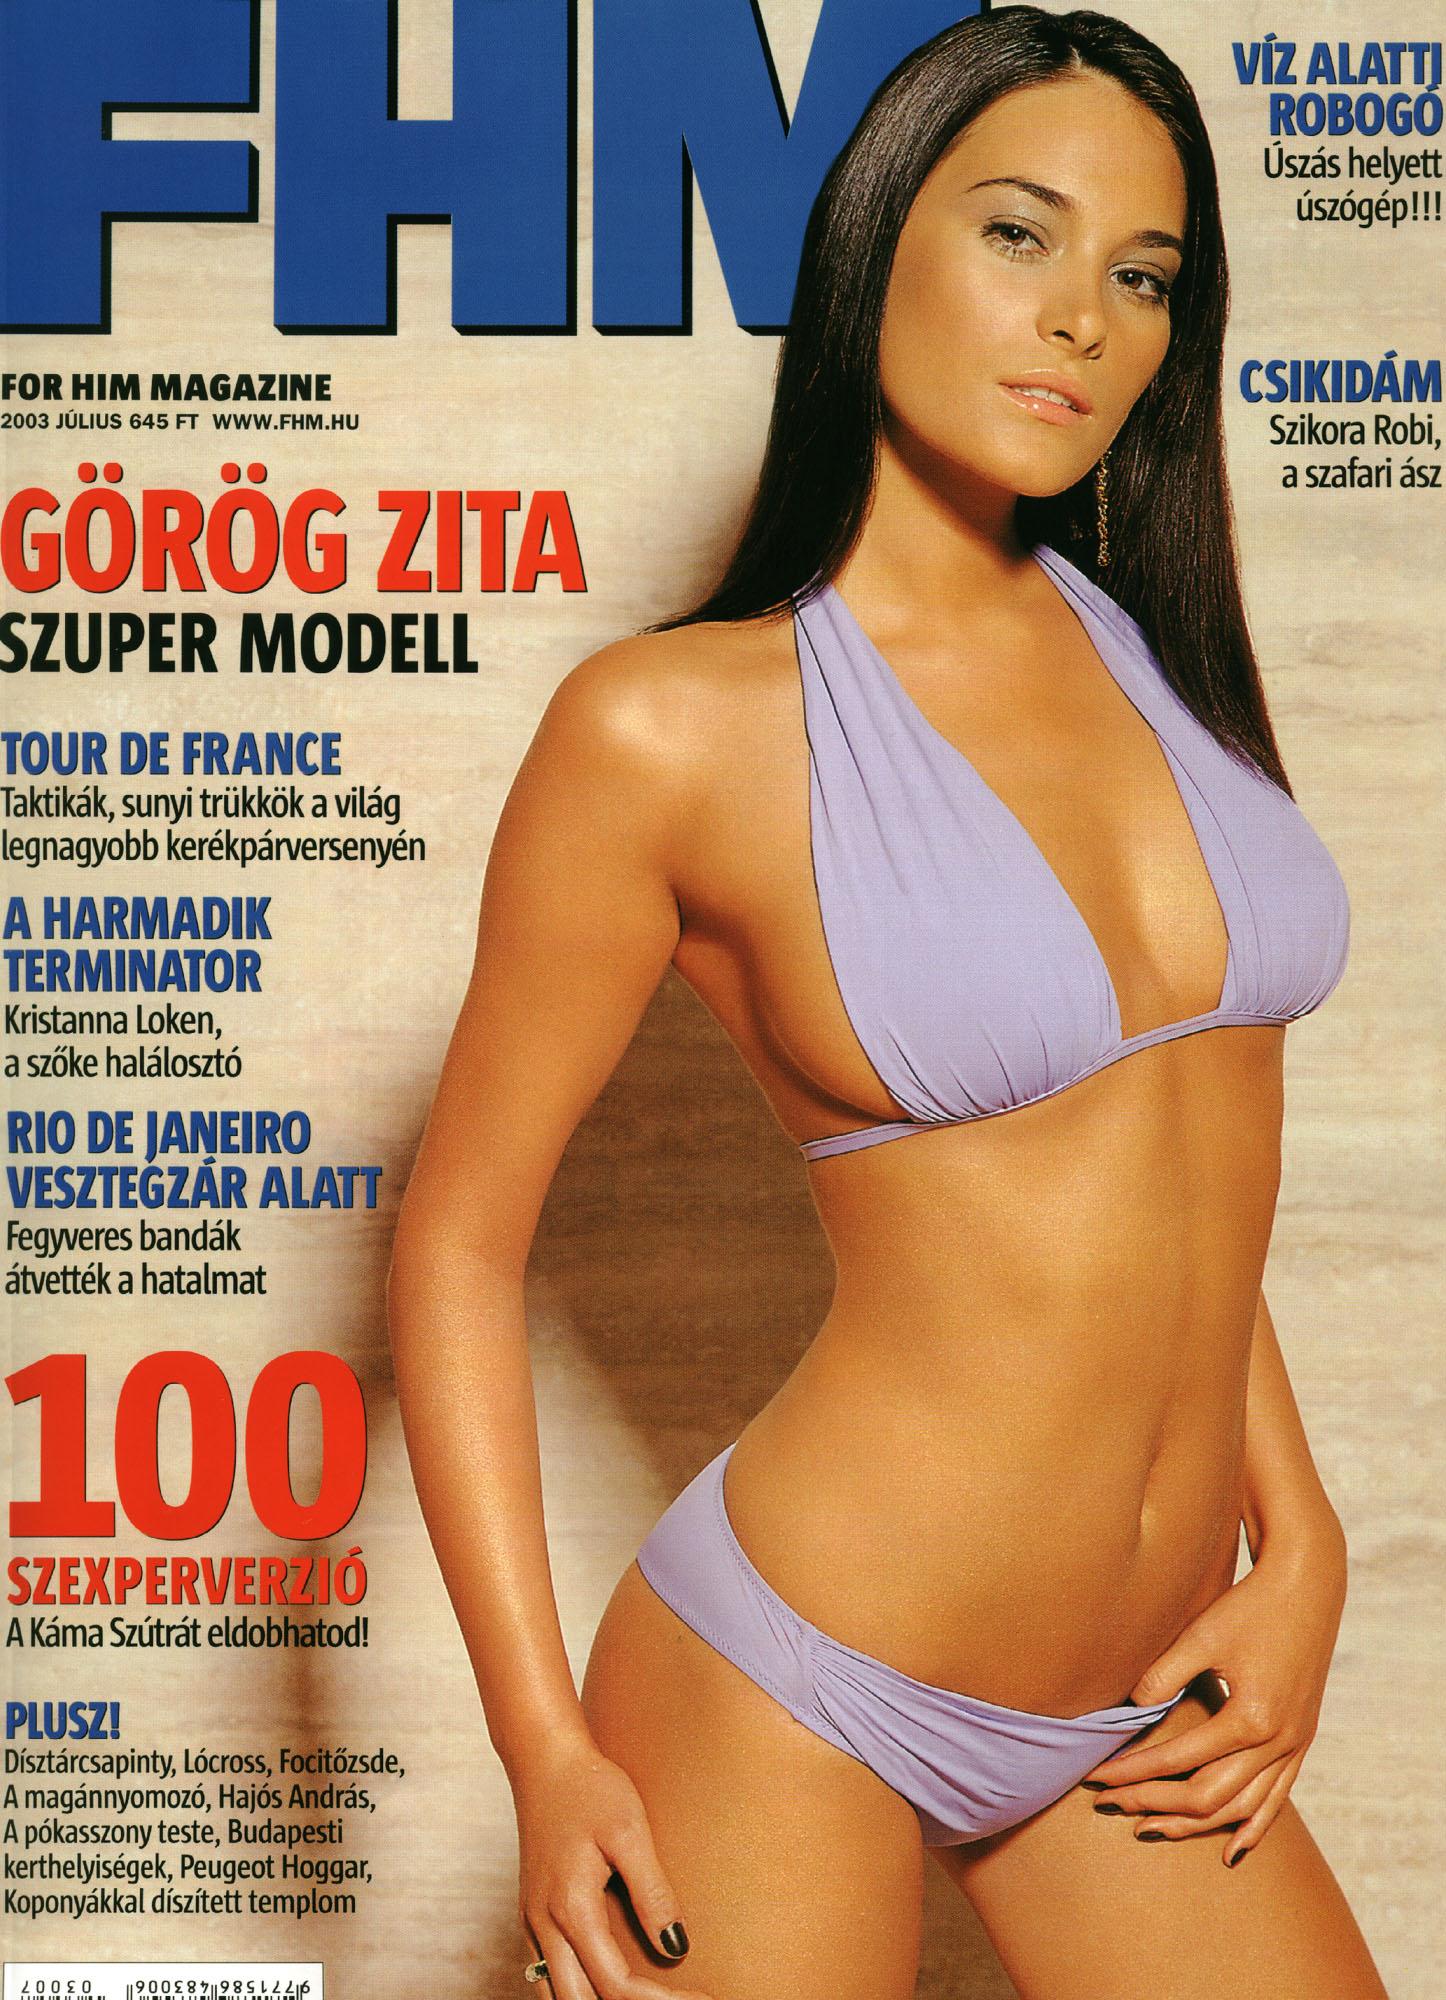 Görög Zita